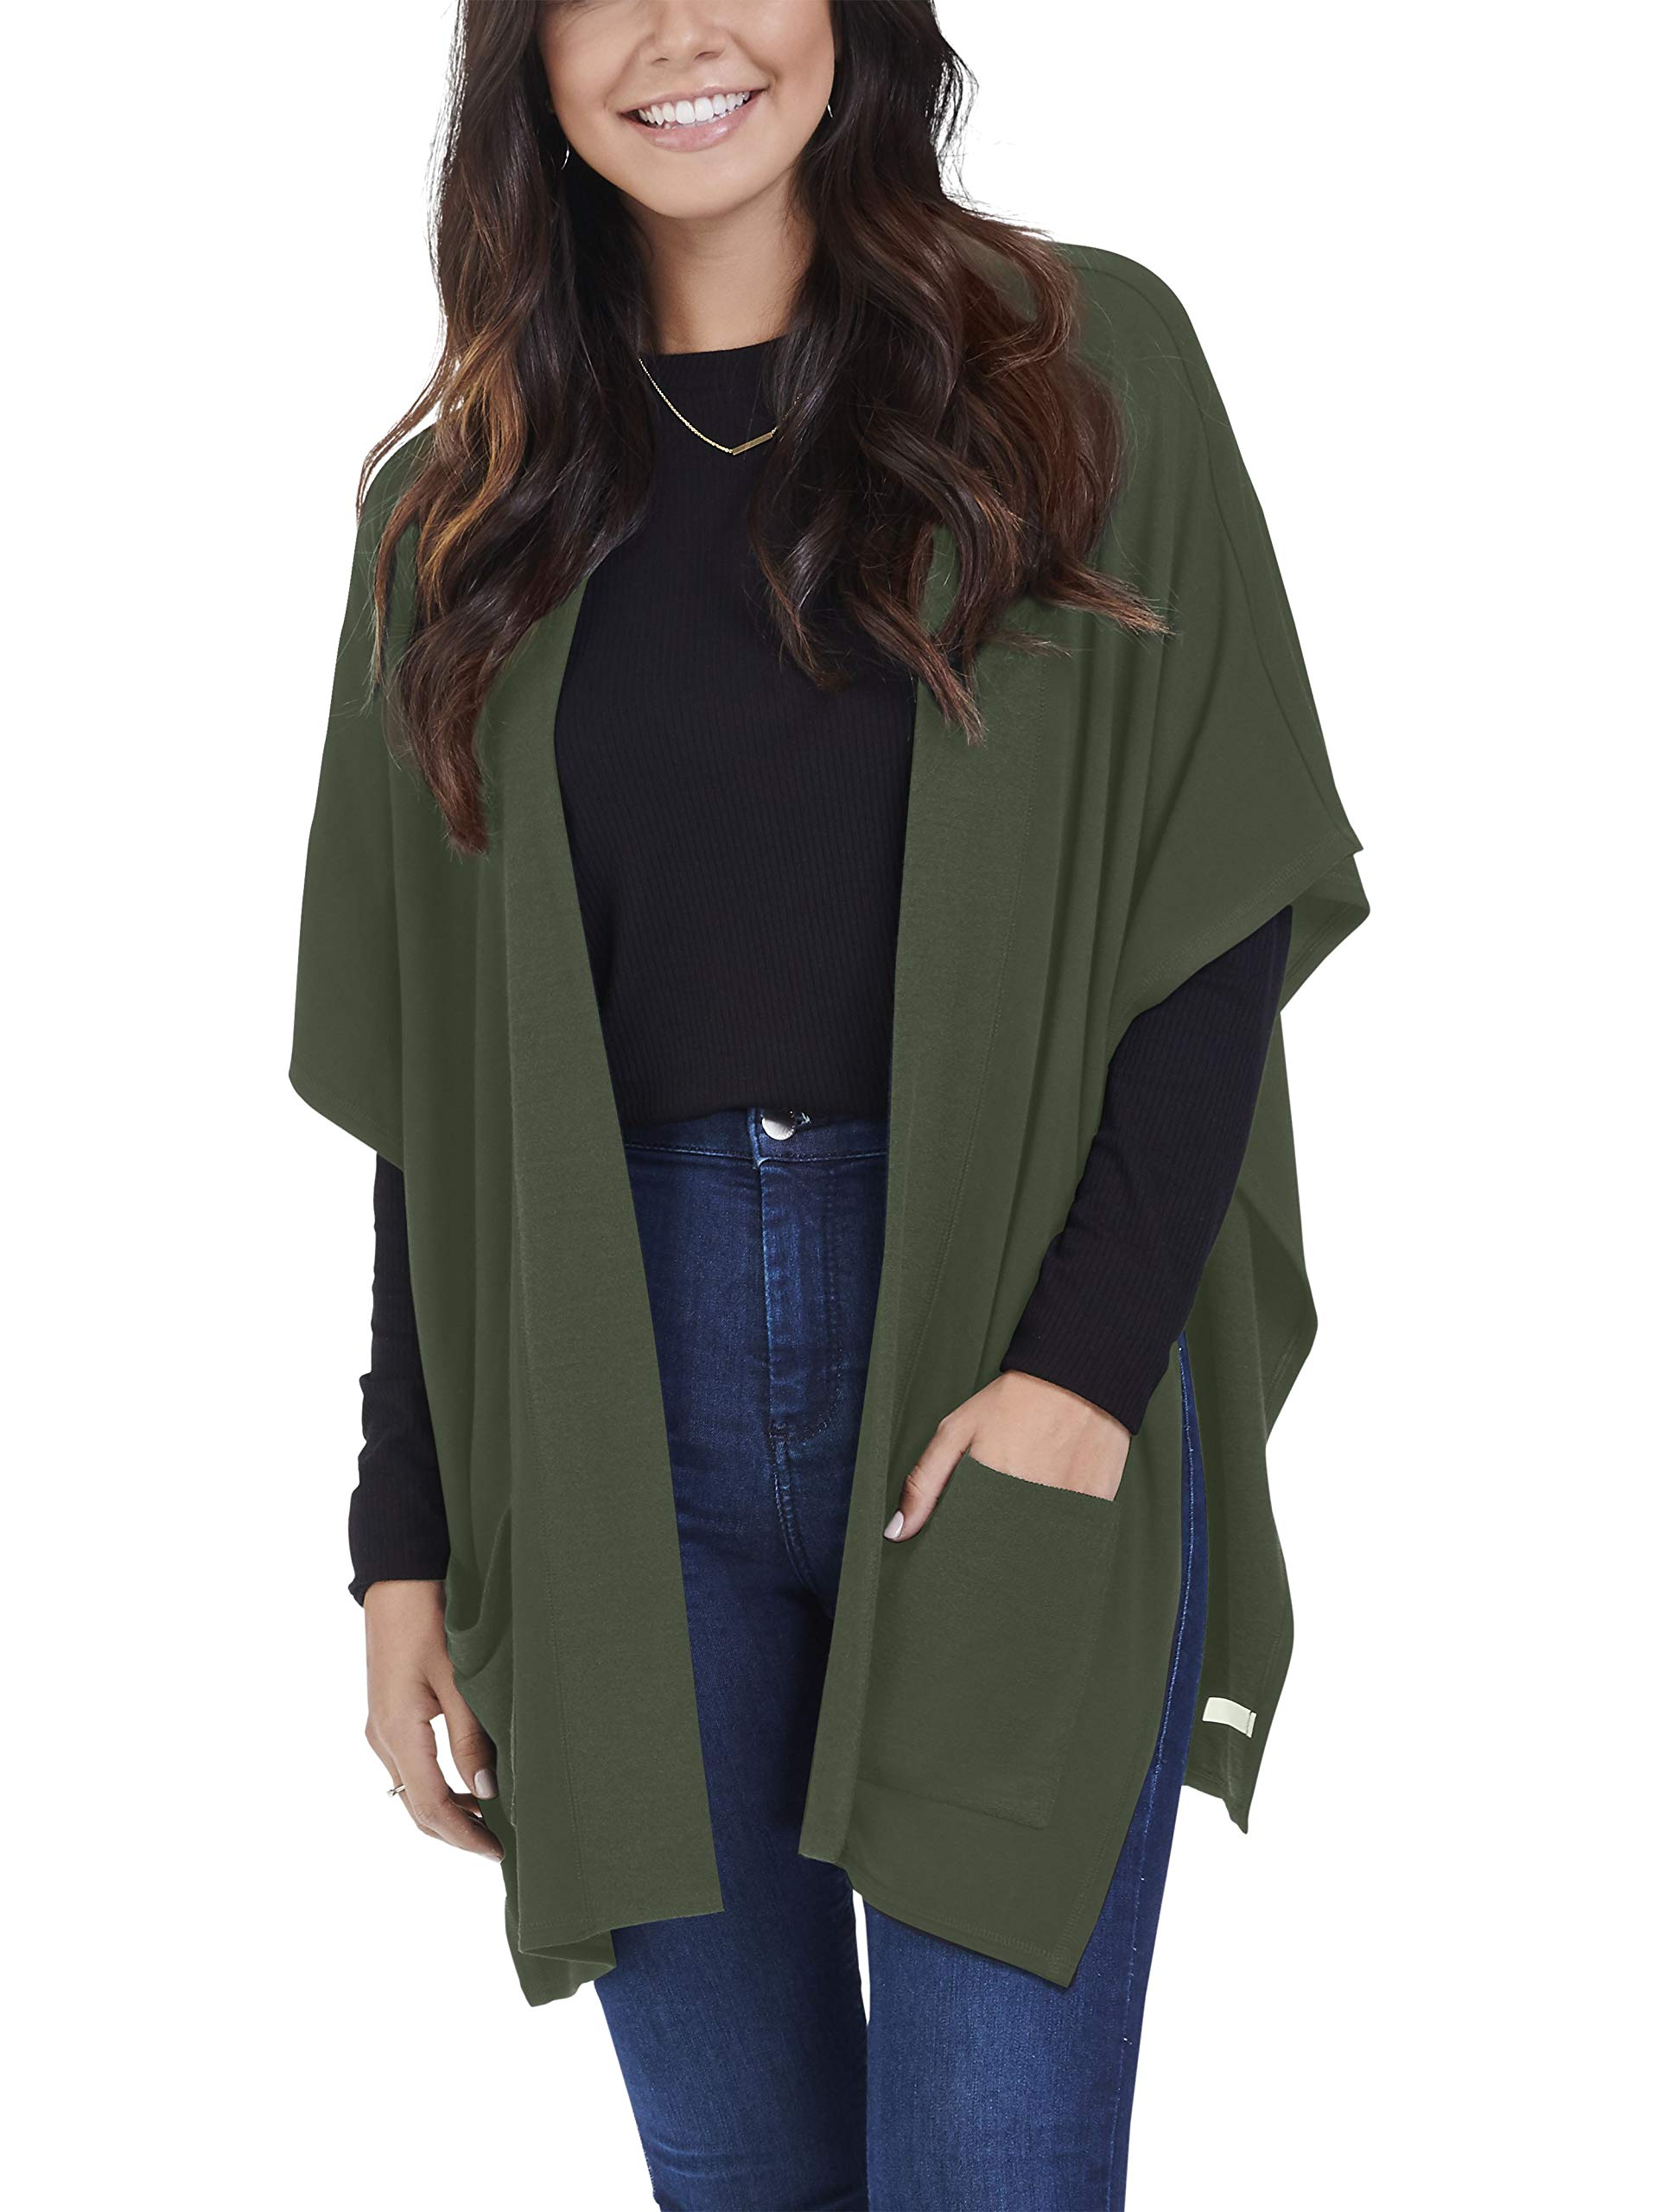 Seek No Further Women's Long Sleeve V-Neck Fleece Blouse